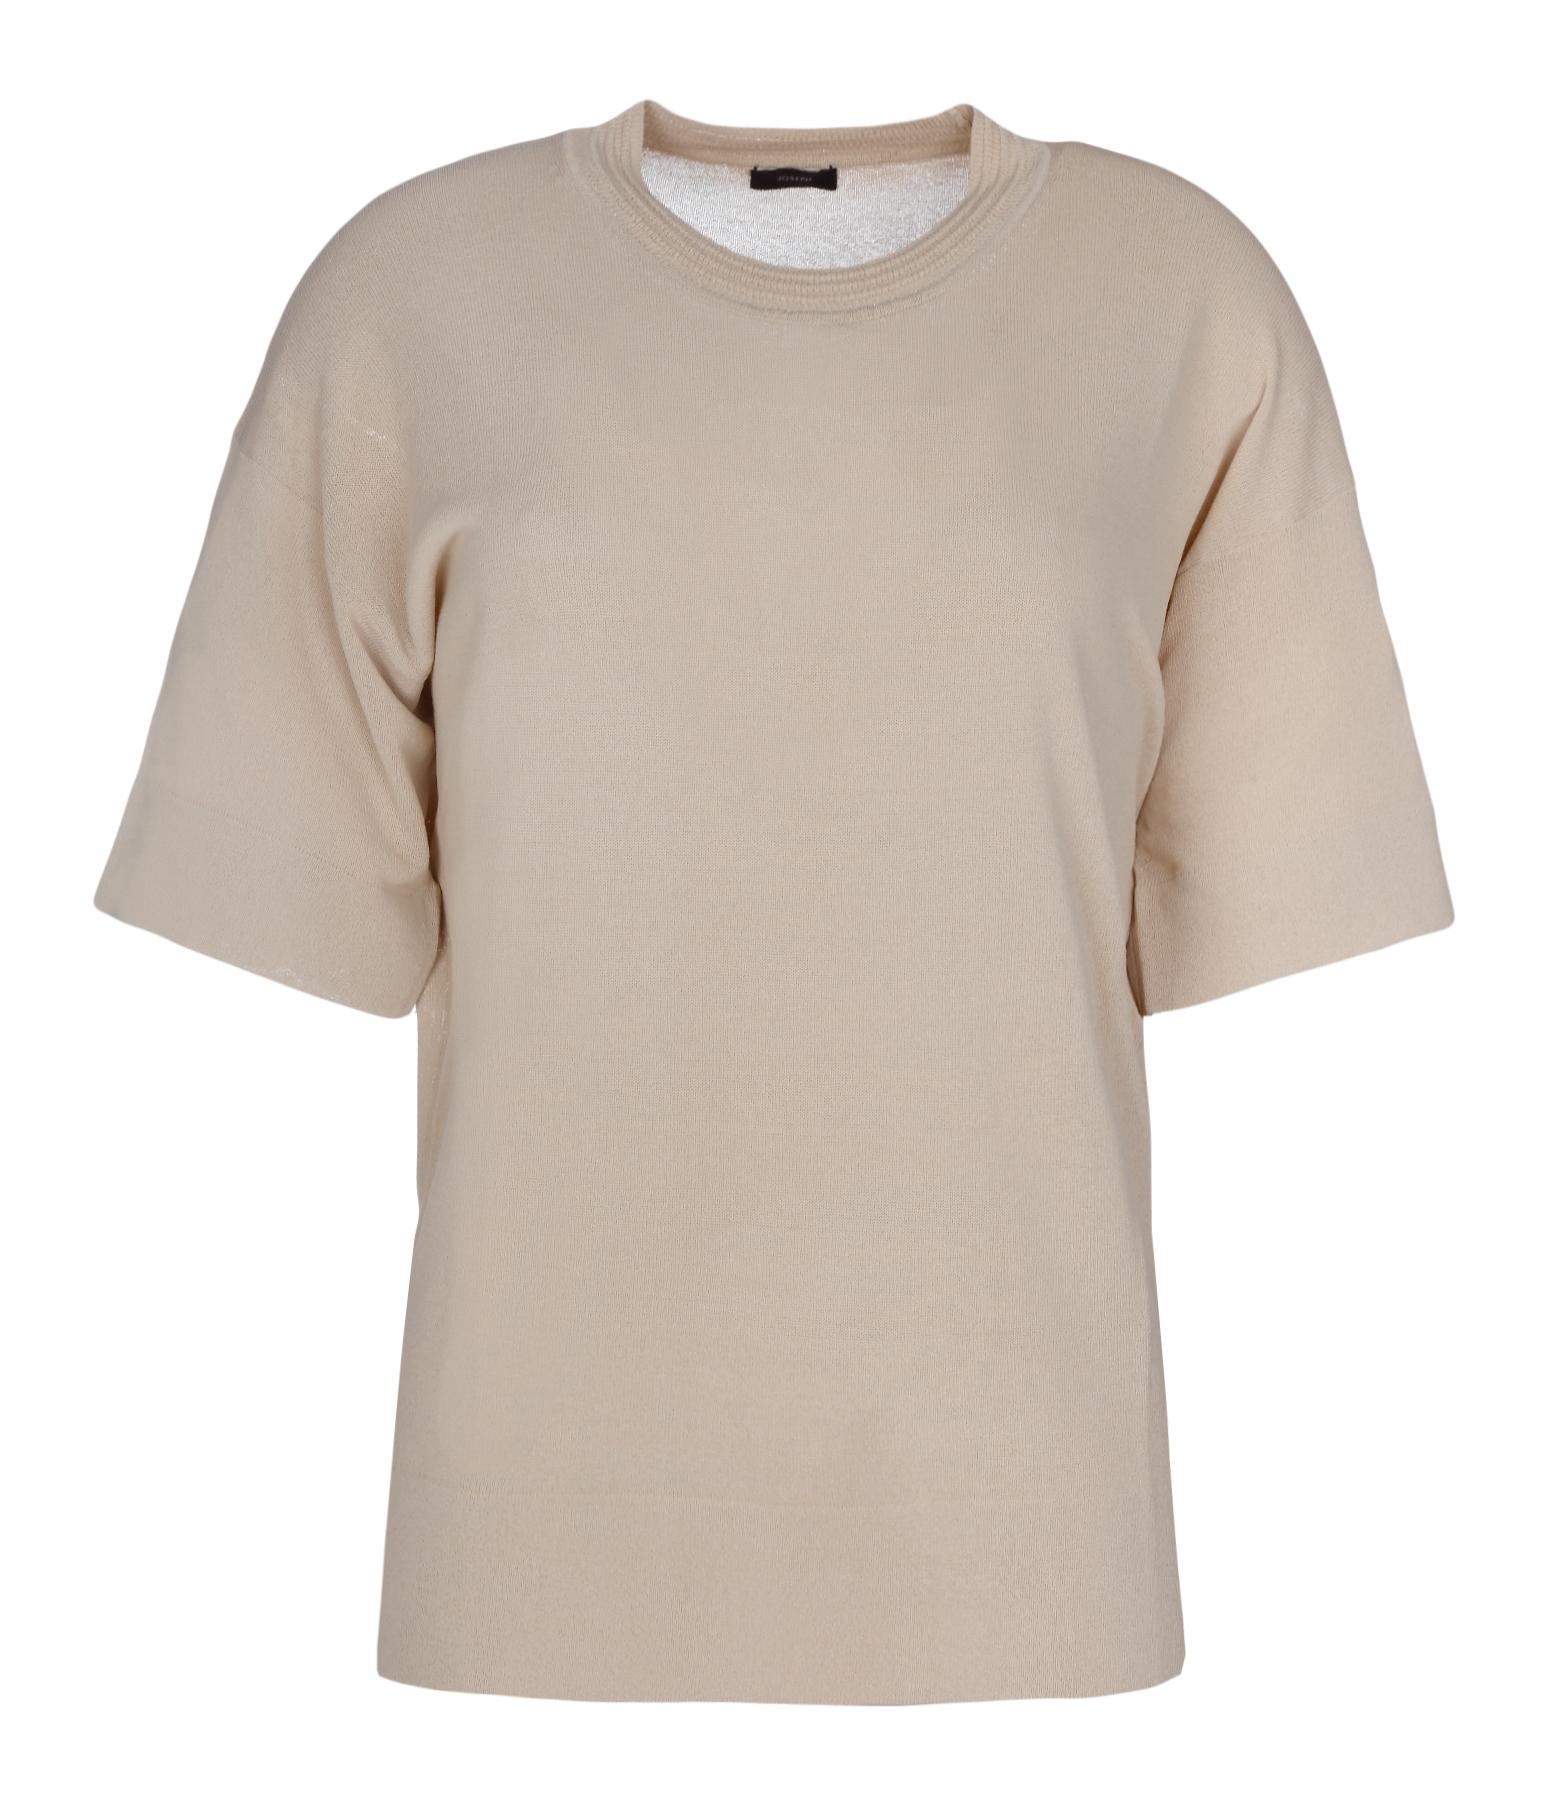 Tee-shirt Fine Stretch Sand